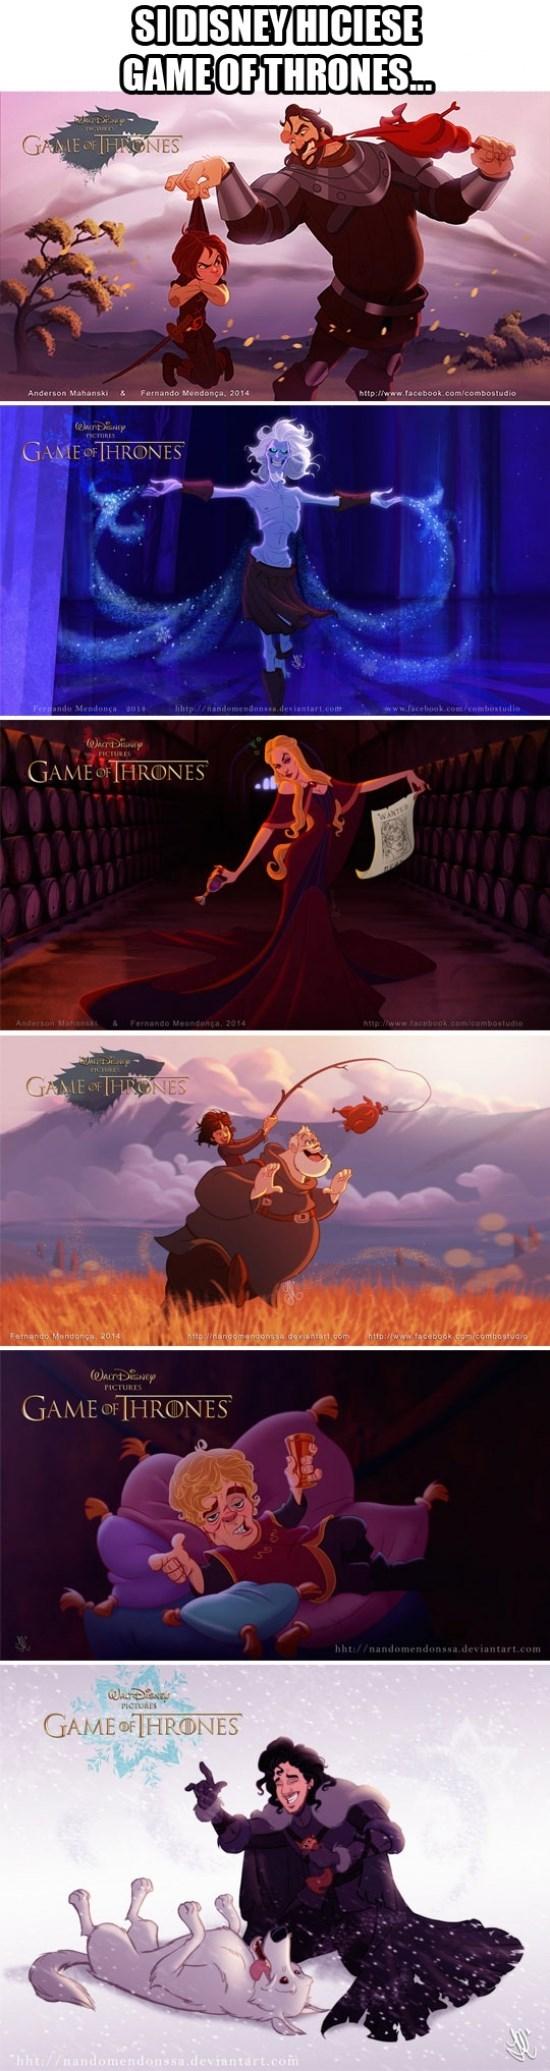 disney game of thrones